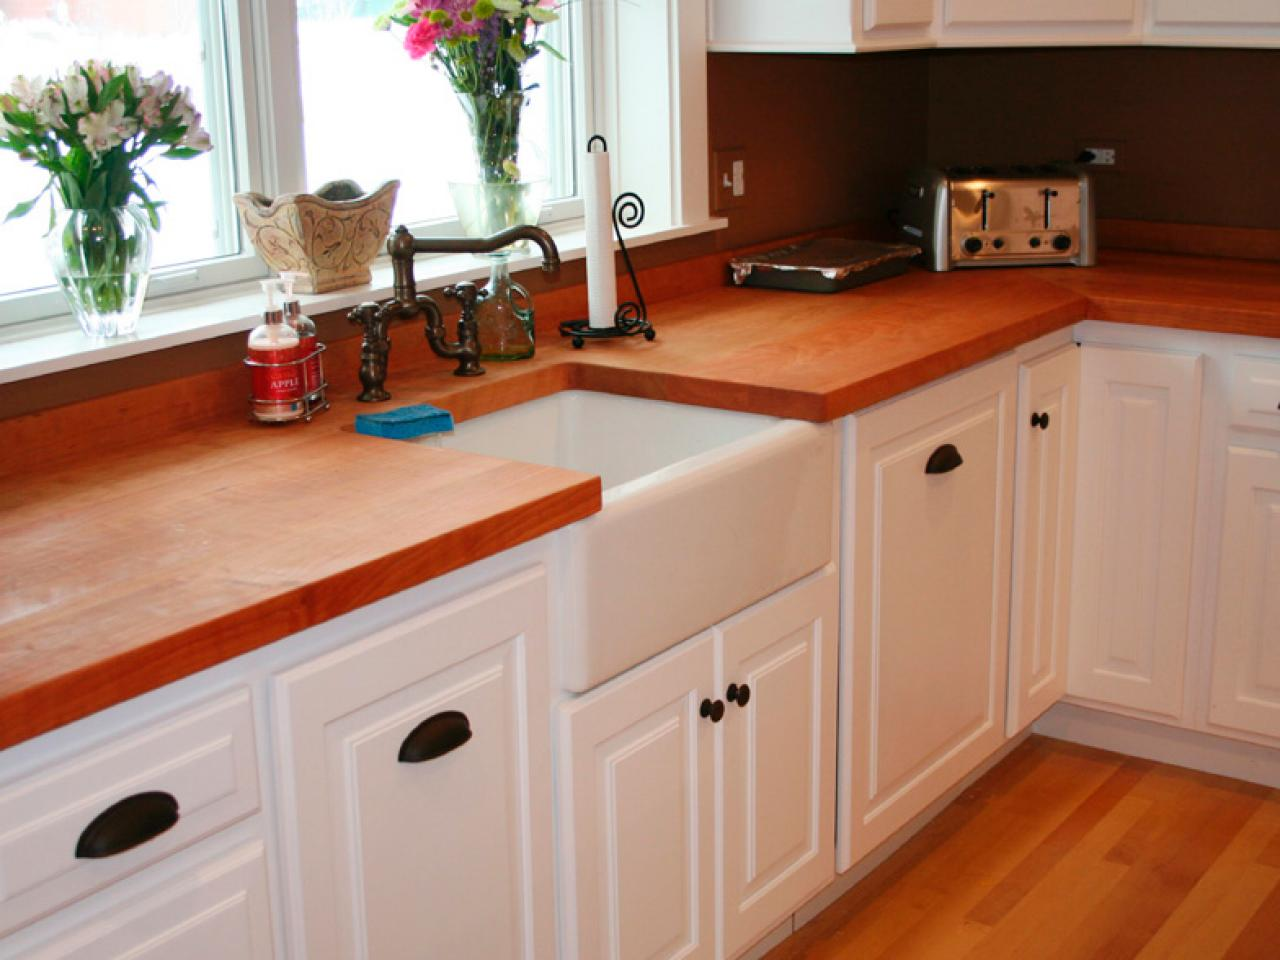 cheap kitchen door knobs photo - 16